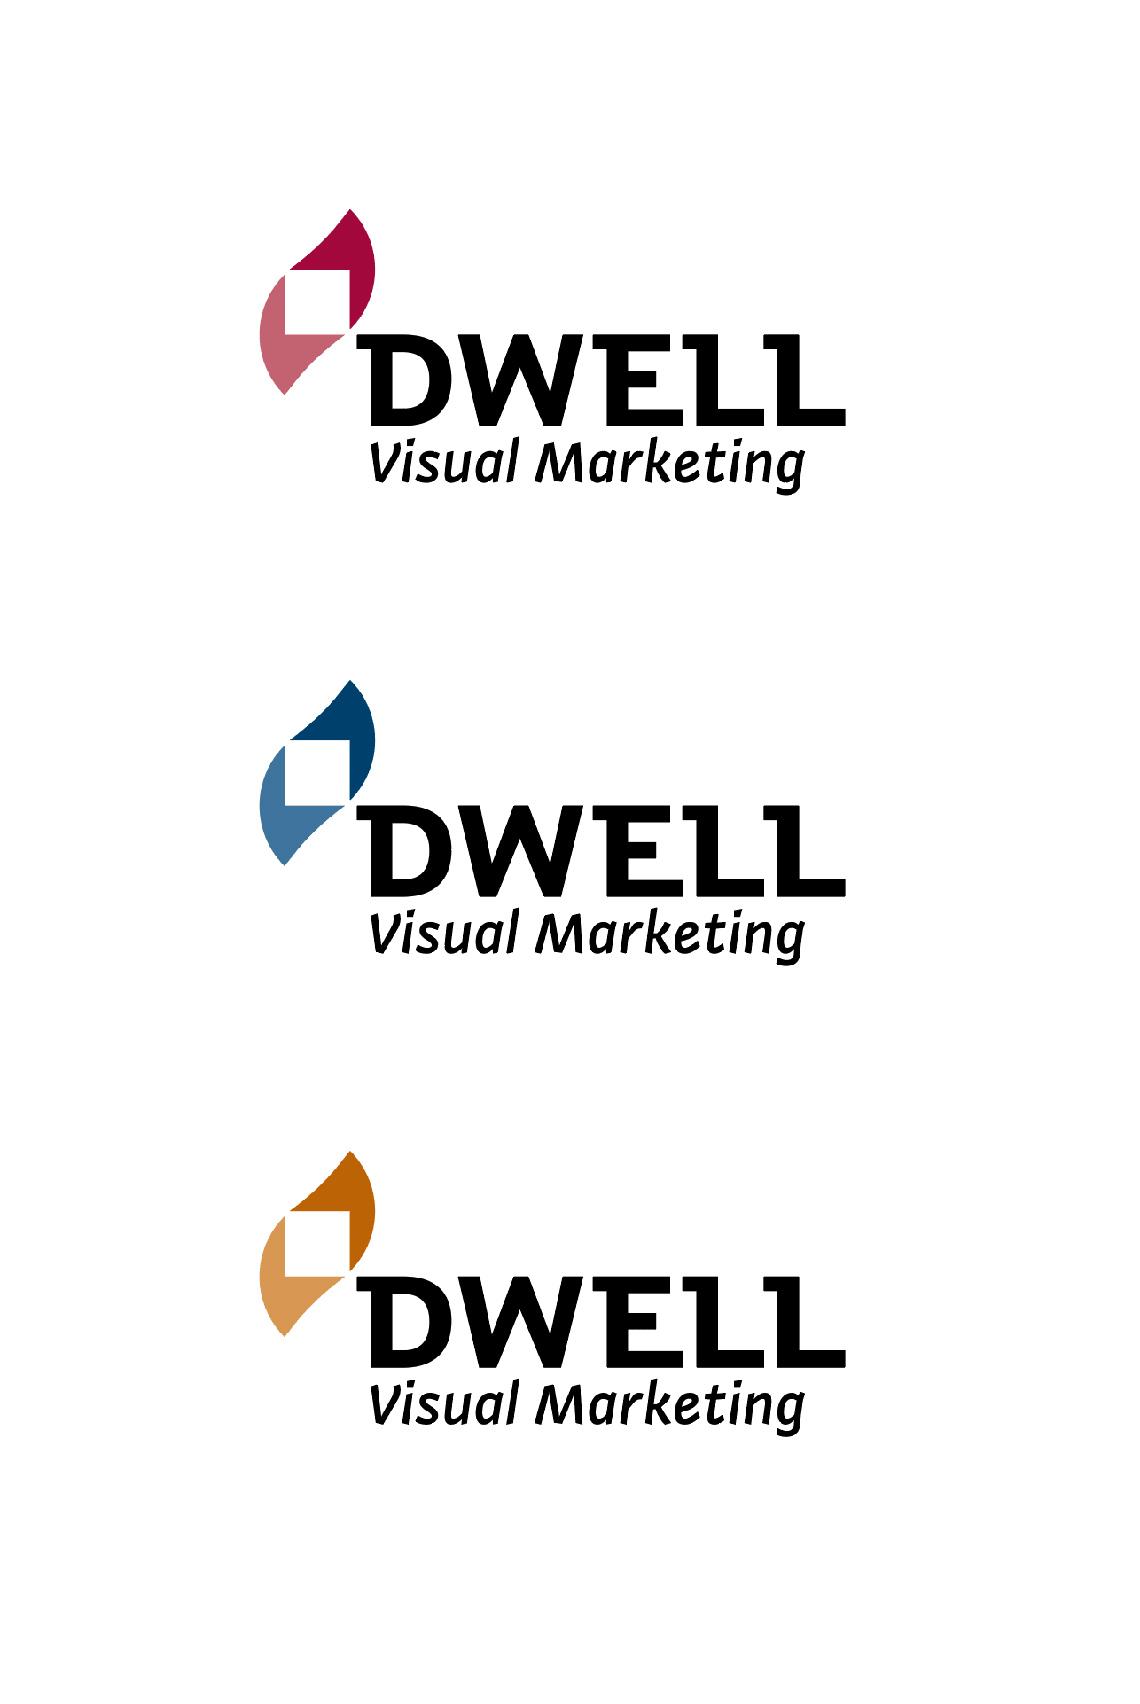 Dwell Logo Design Color Version